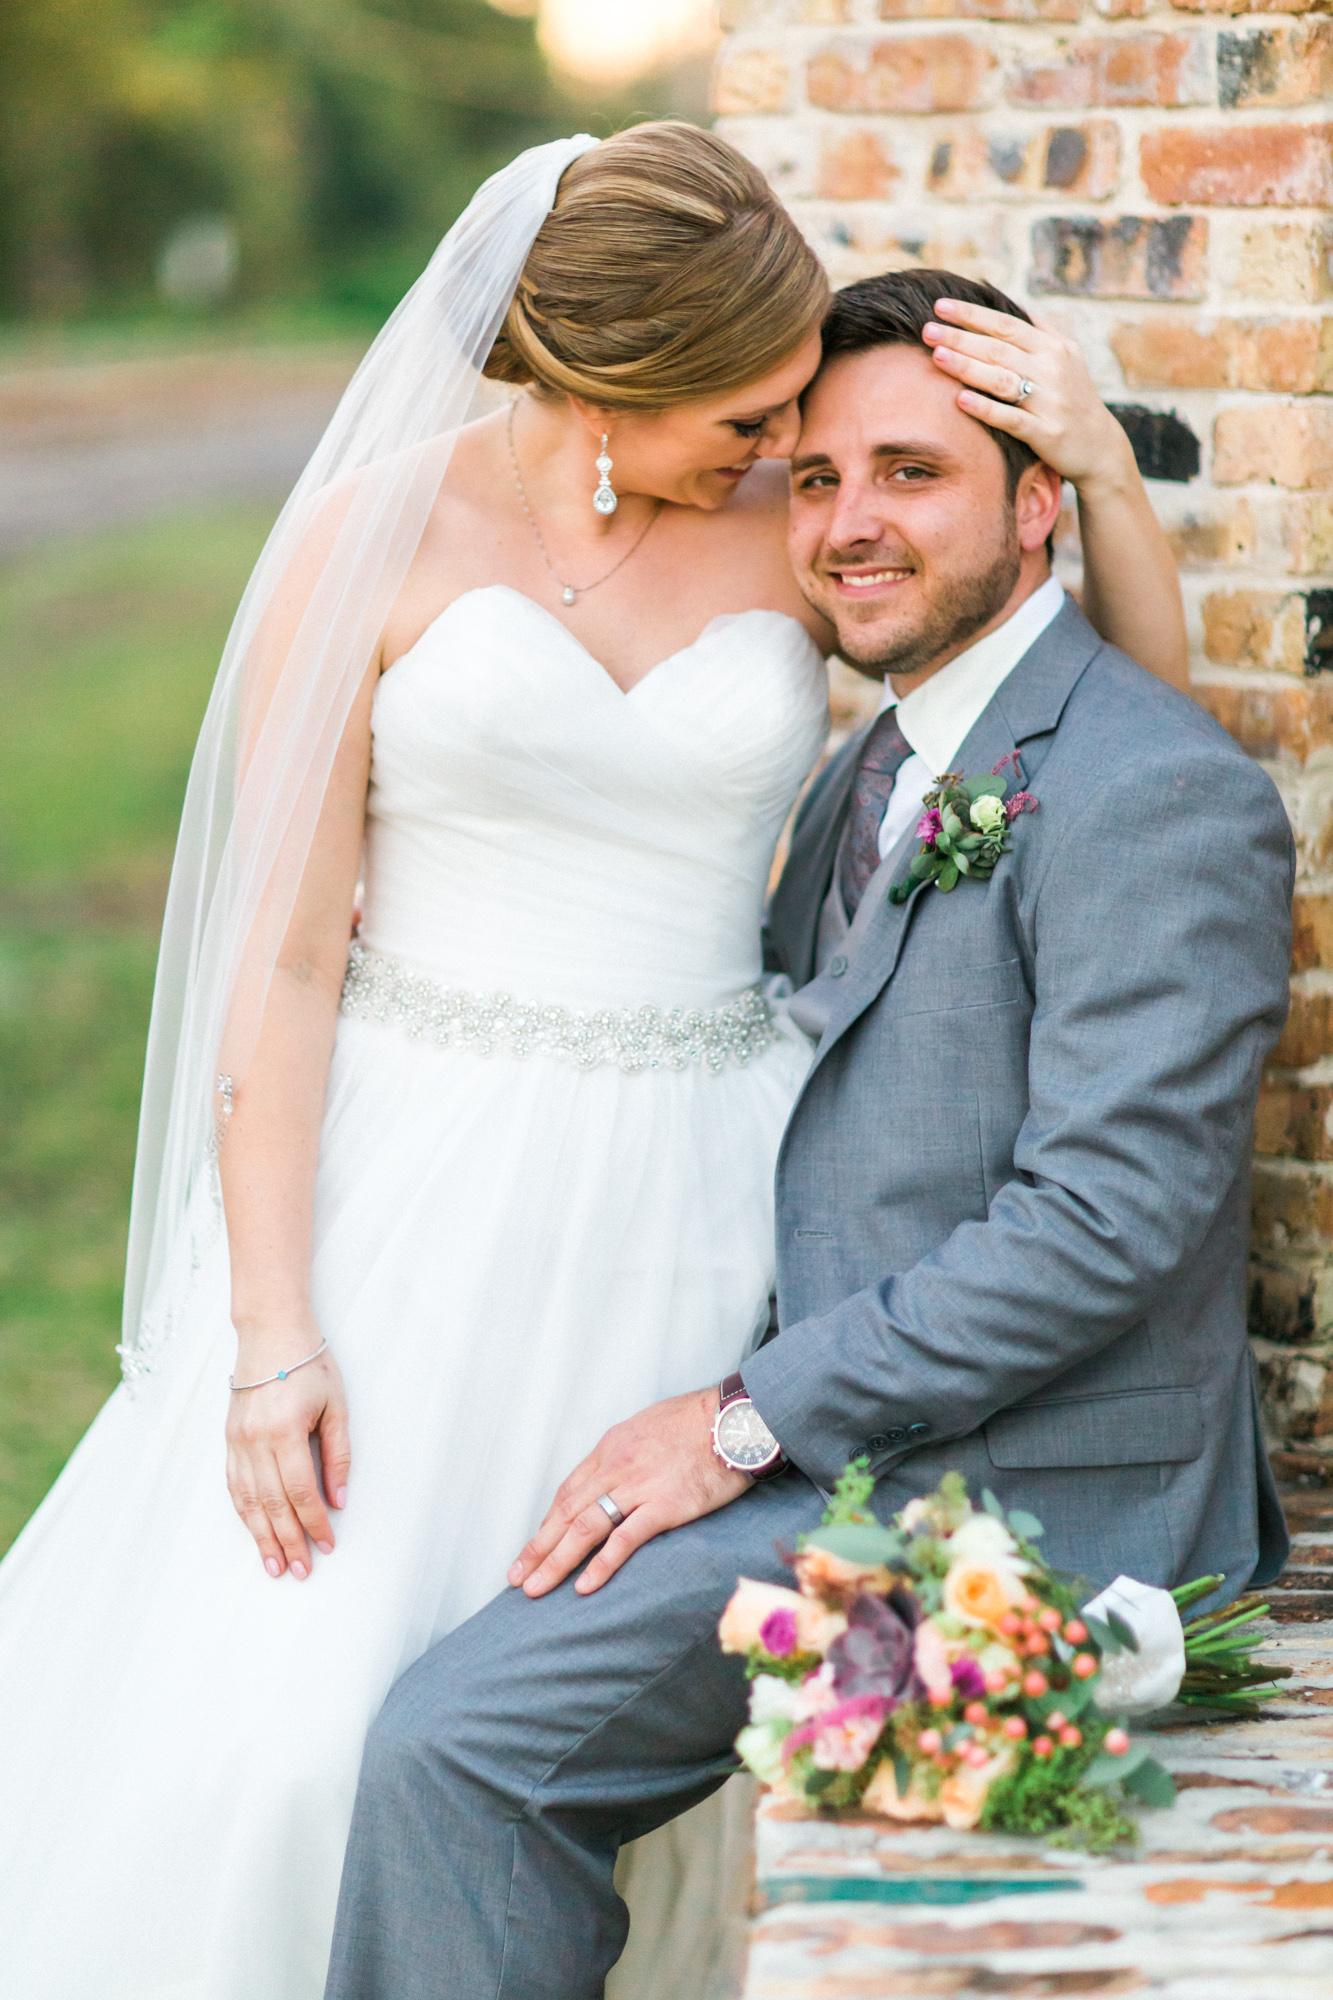 Winter Park Farmer's Market Wedding- Michael & Megan Fine Art Wedding Purple echeveria eucalyptus rose florals13.jpg